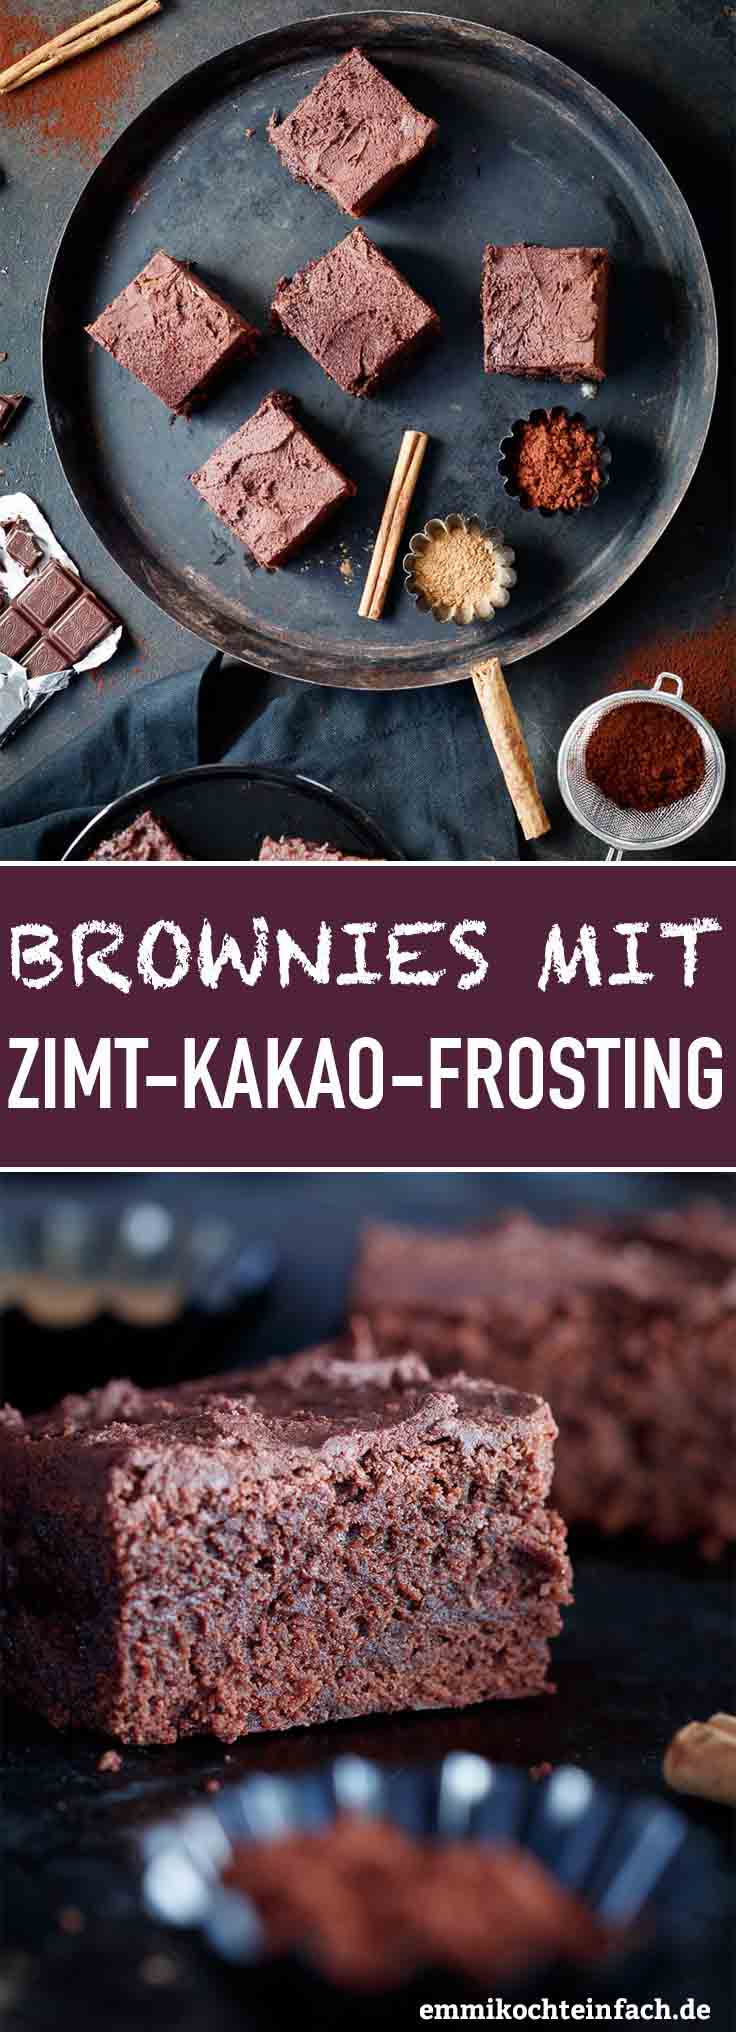 Brownies mit Zimt-Kakao-Frosting - www.emmikochteinfach.de